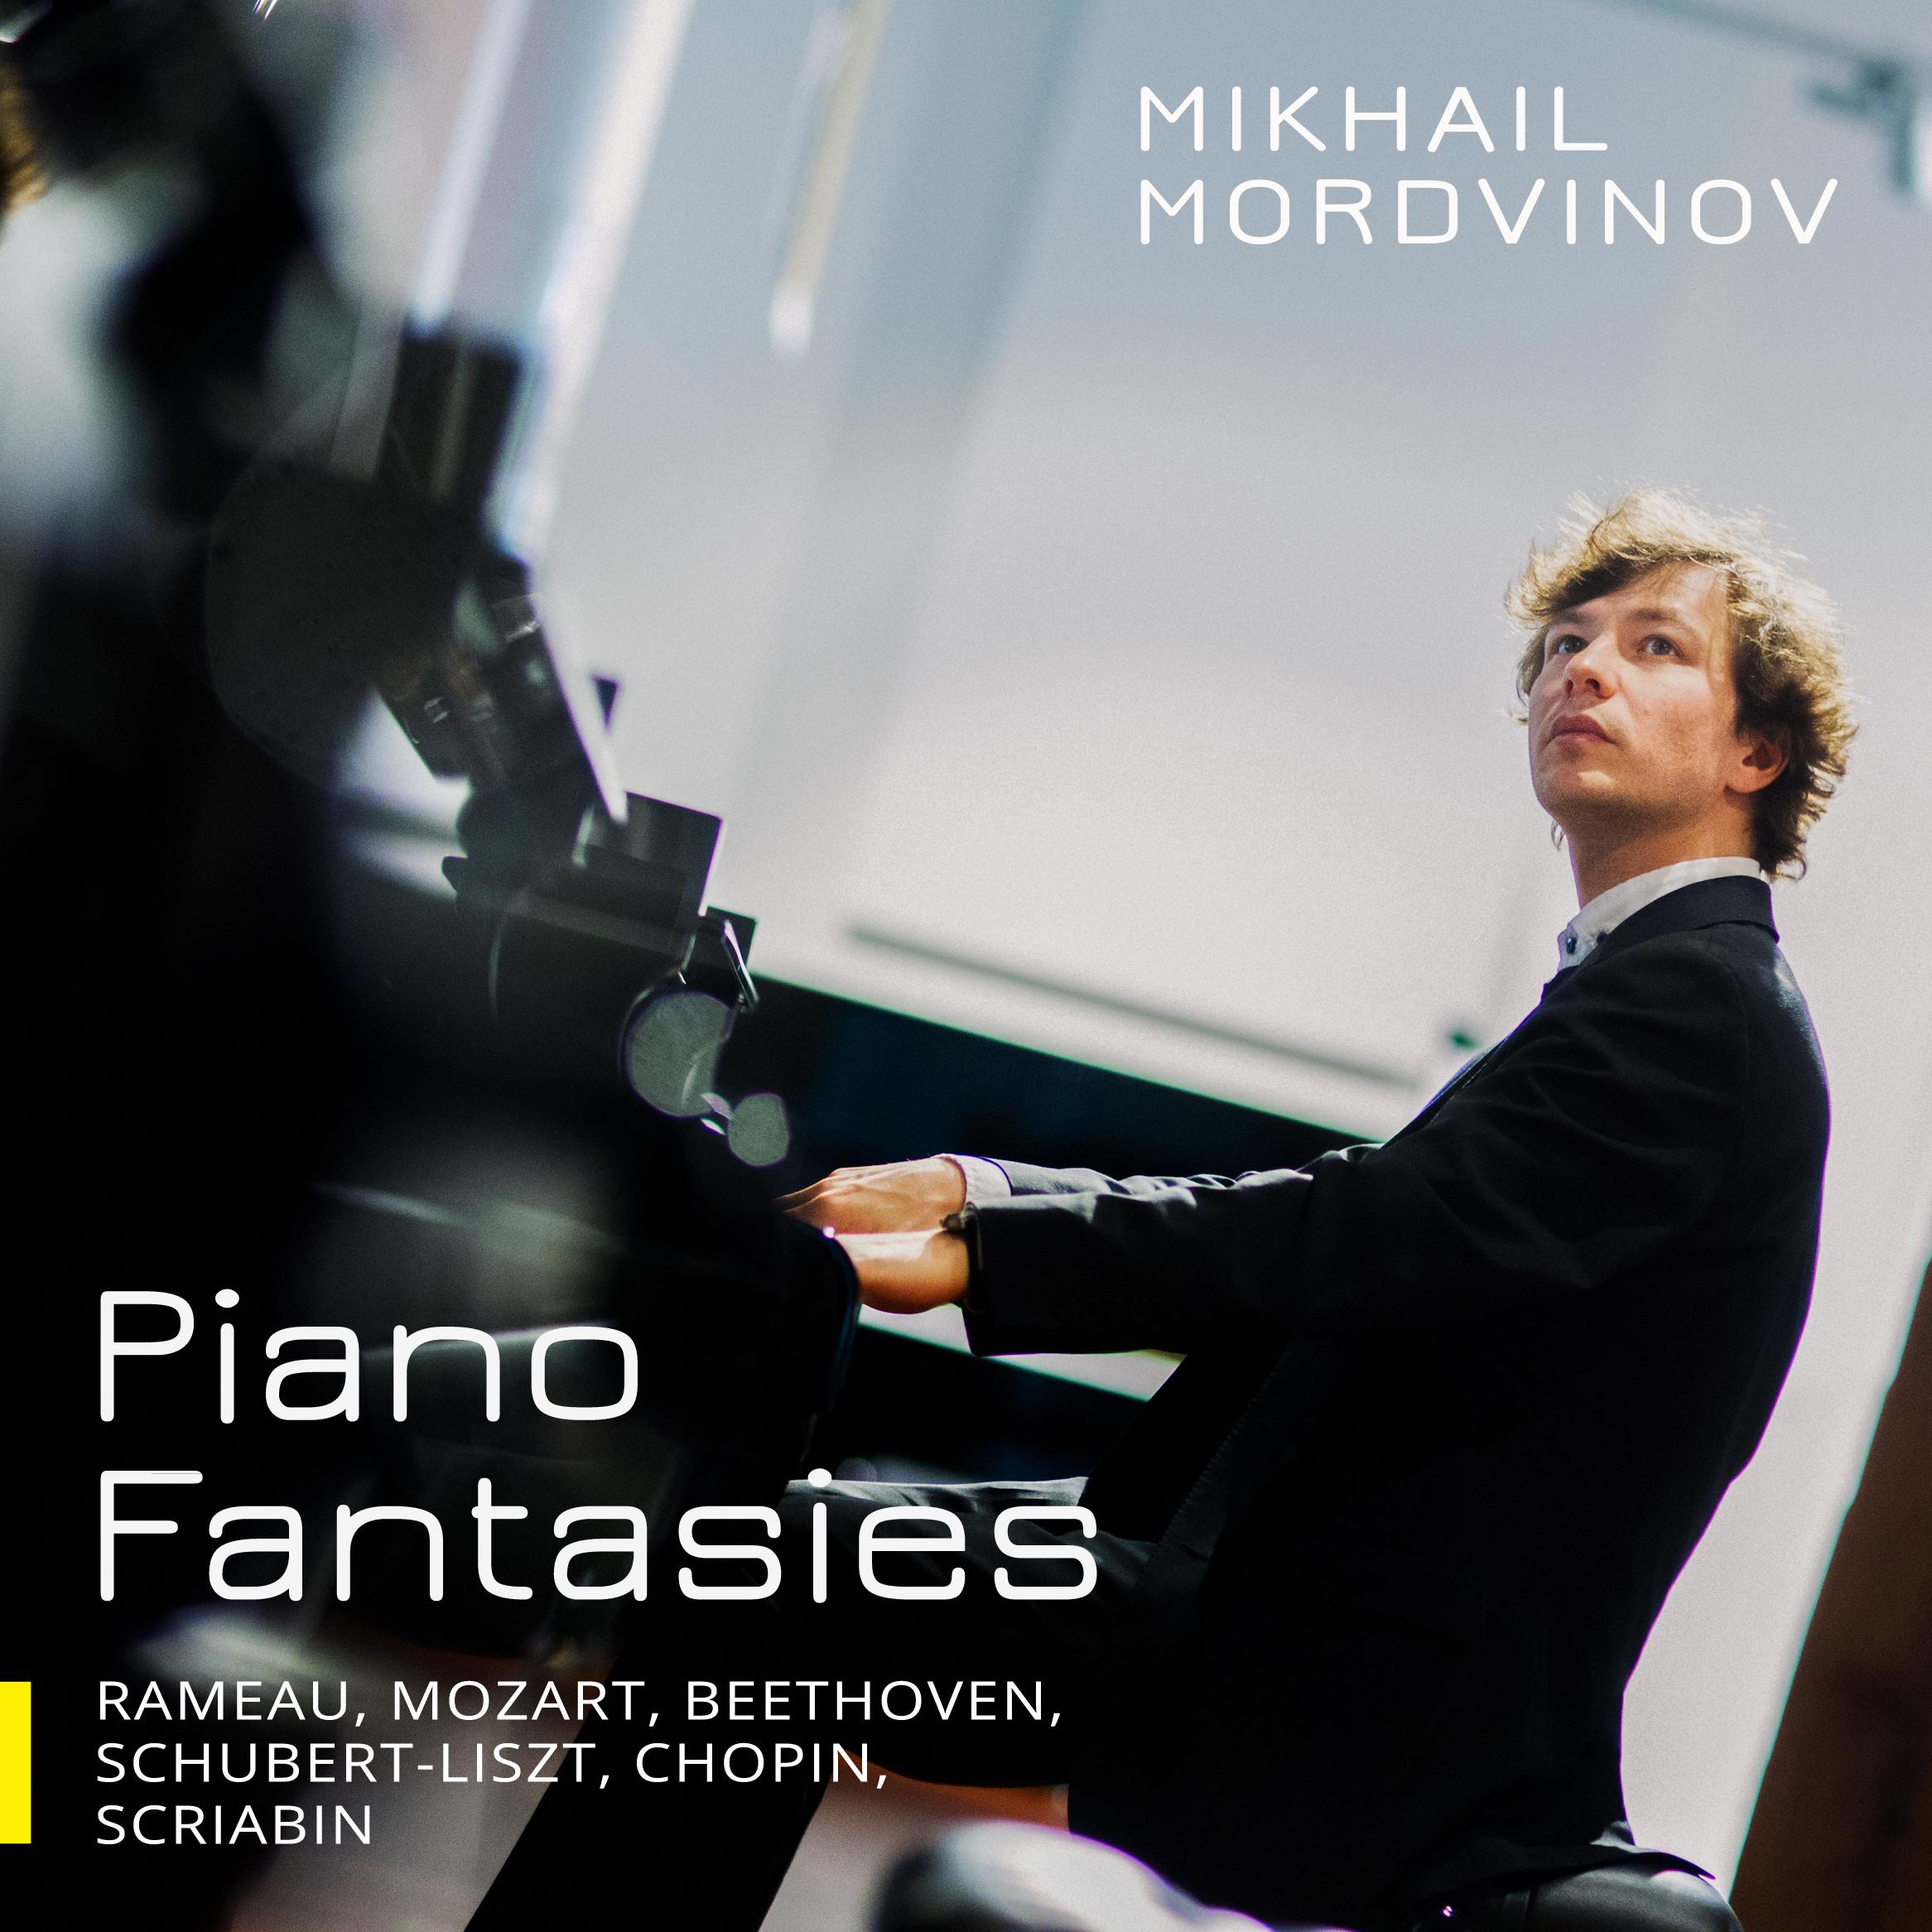 Mikhail Mordvinov: Piano Fantasies